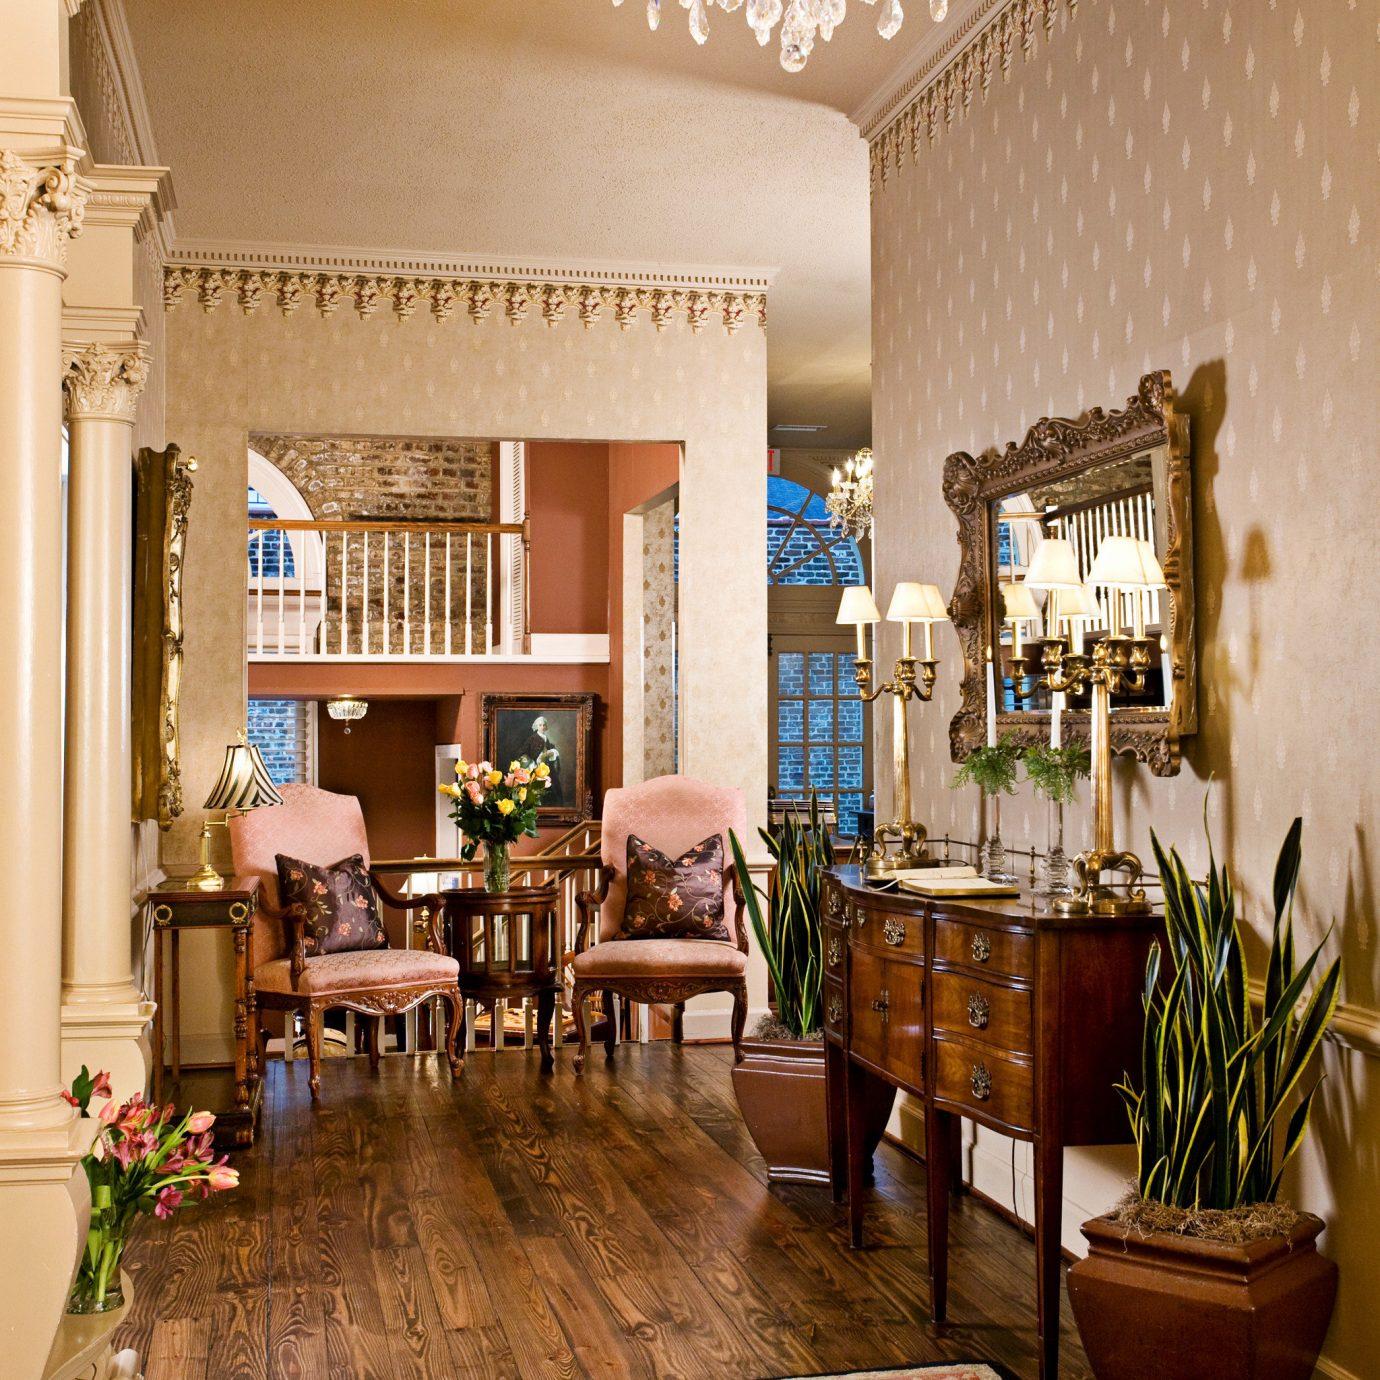 Elegant Fireplace Historic Lounge Luxury living room property home Lobby hardwood mansion condominium farmhouse wood flooring flooring